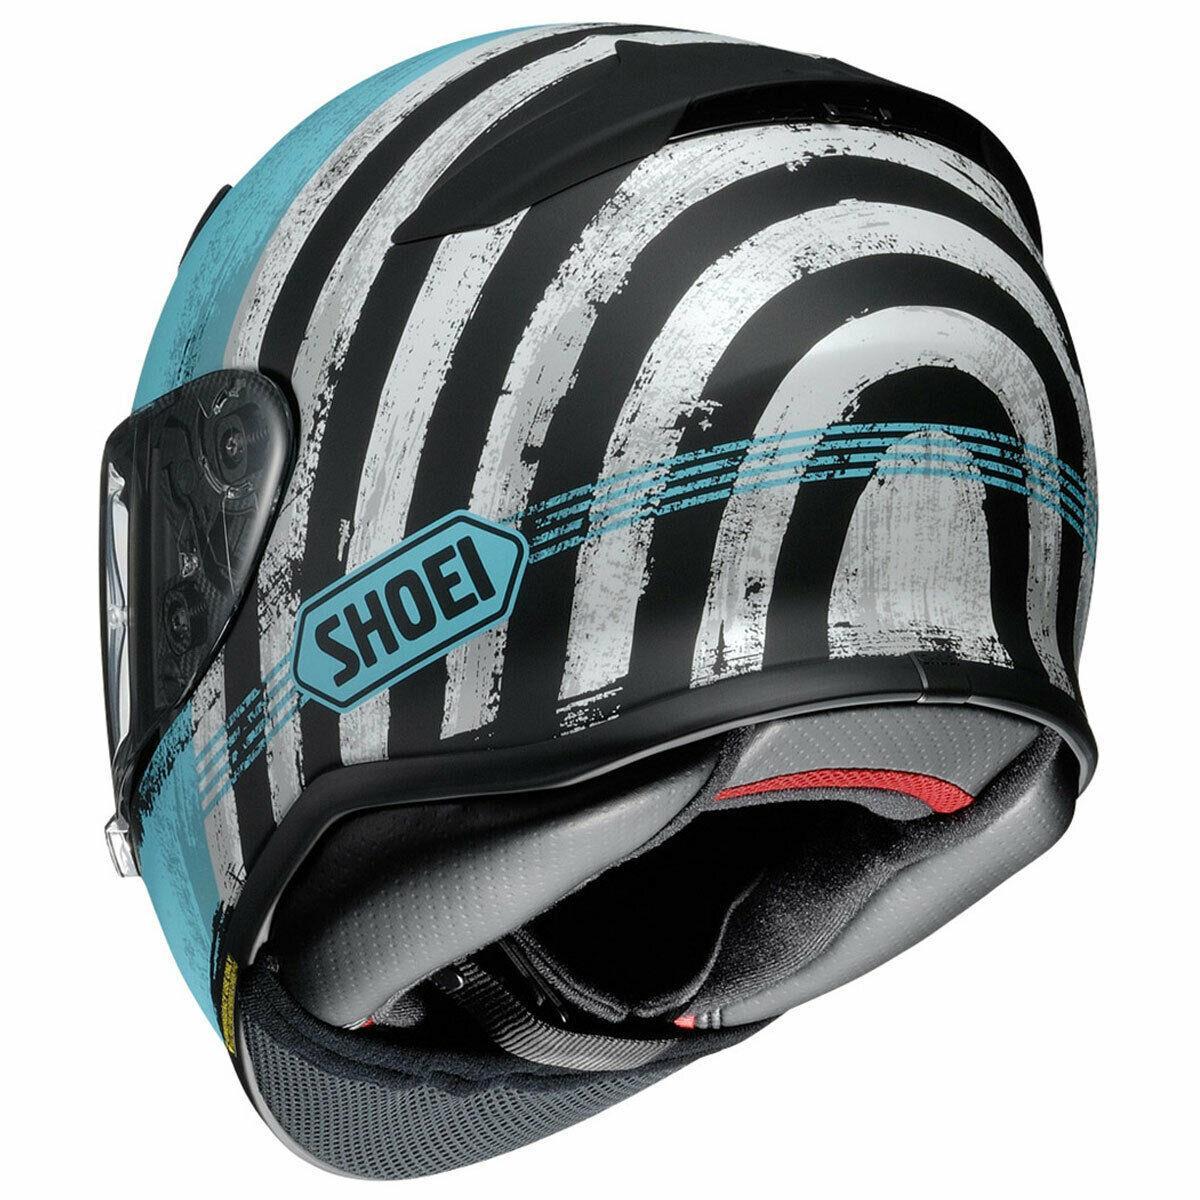 Shoei-NXR-Full-Face-Motorcycle-Motorbike-Premium-Helmet-RF-1200 thumbnail 24